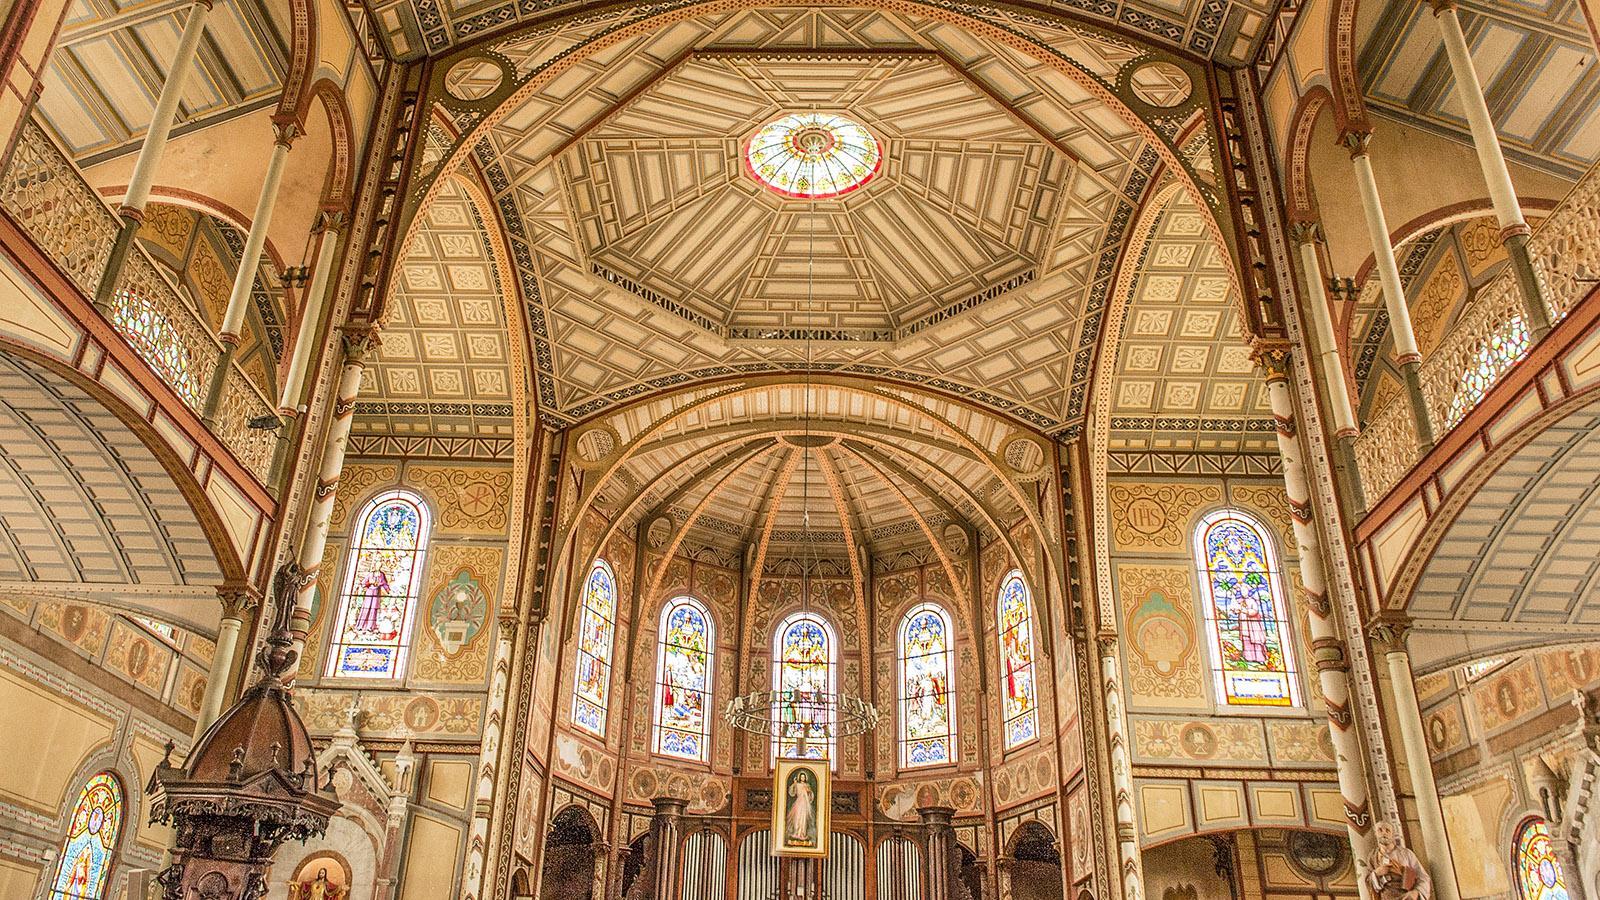 Der Altar und Chor der Kathedrale von Fort-de-France. Foto: Hilke Maunder